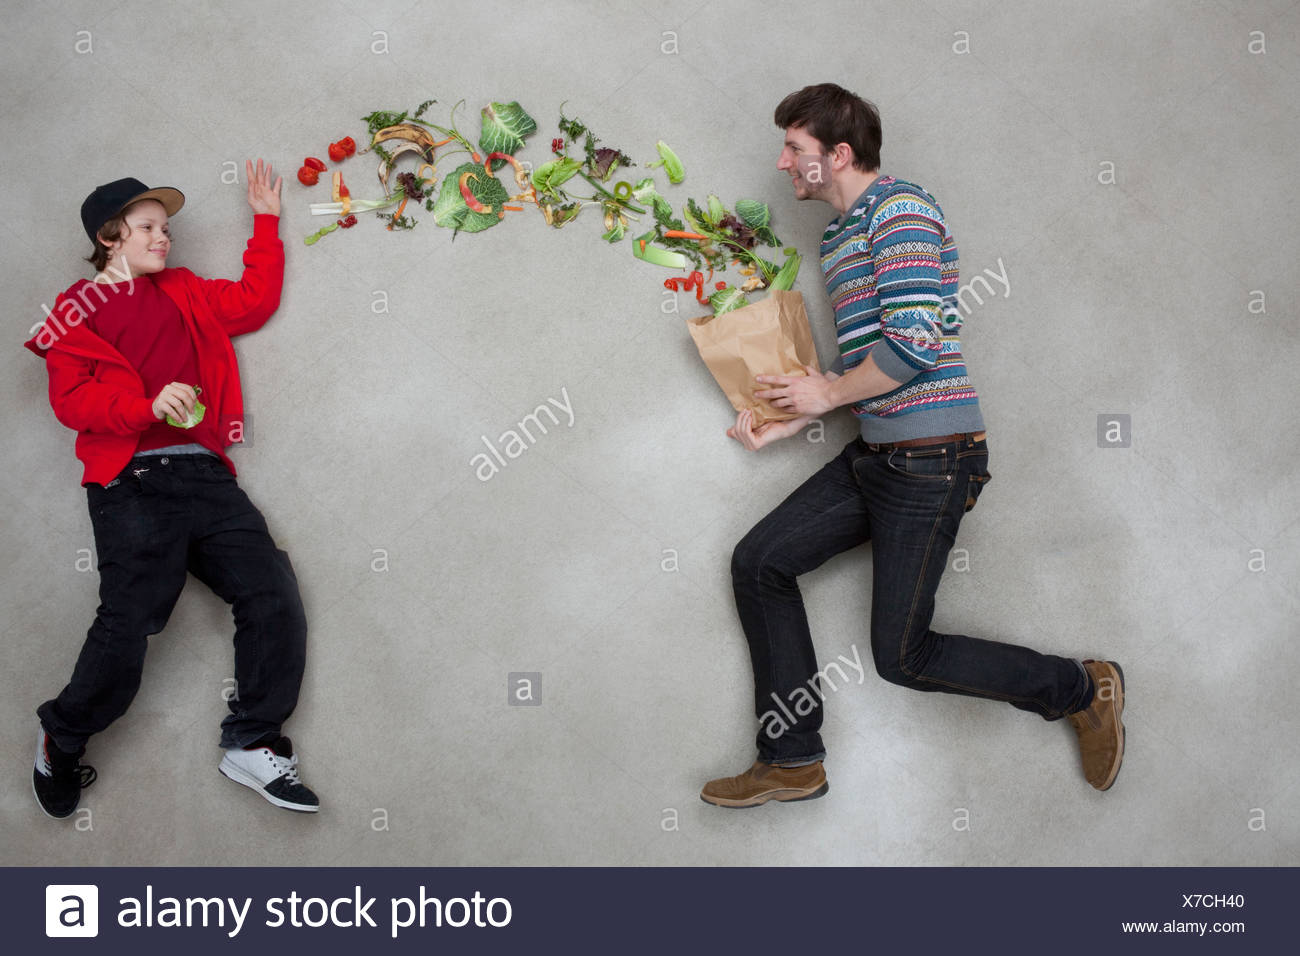 Man and boy balancing vegetables - Stock Image